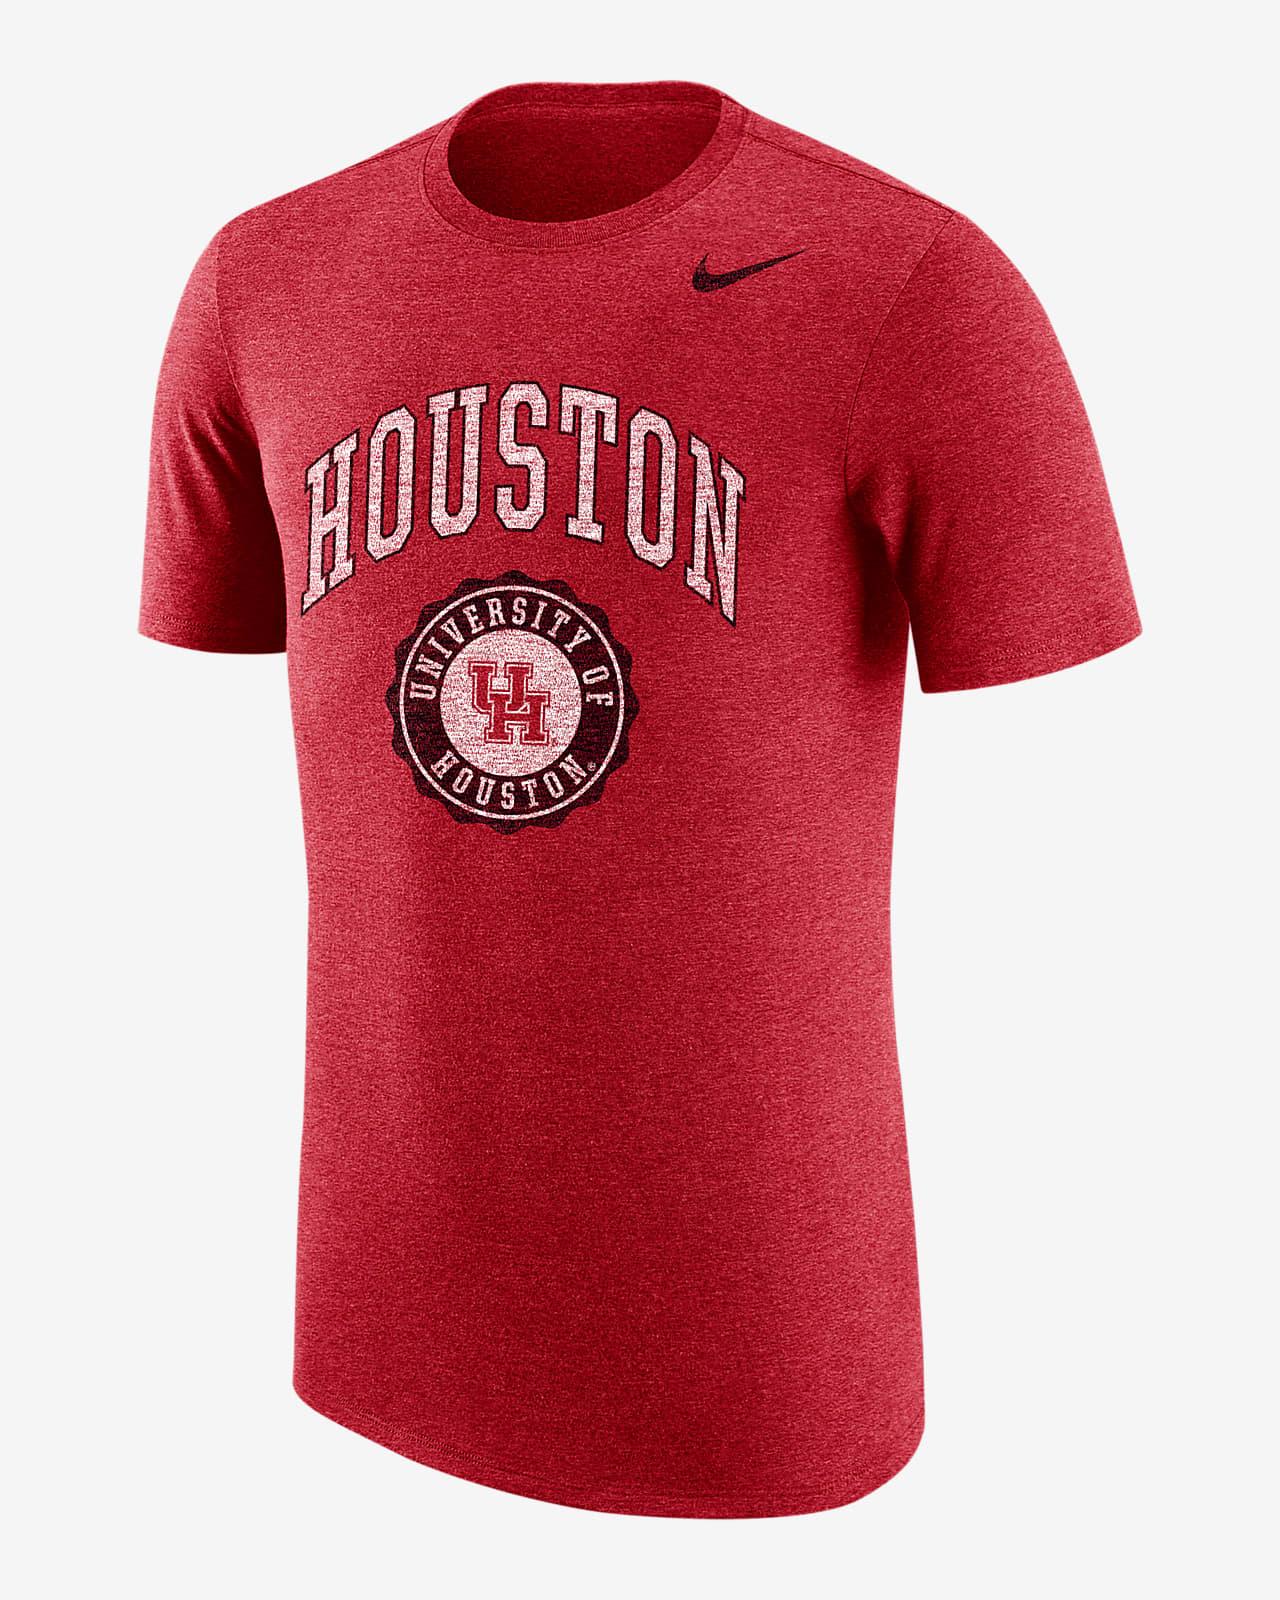 Nike College (Houston) Men's T-Shirt